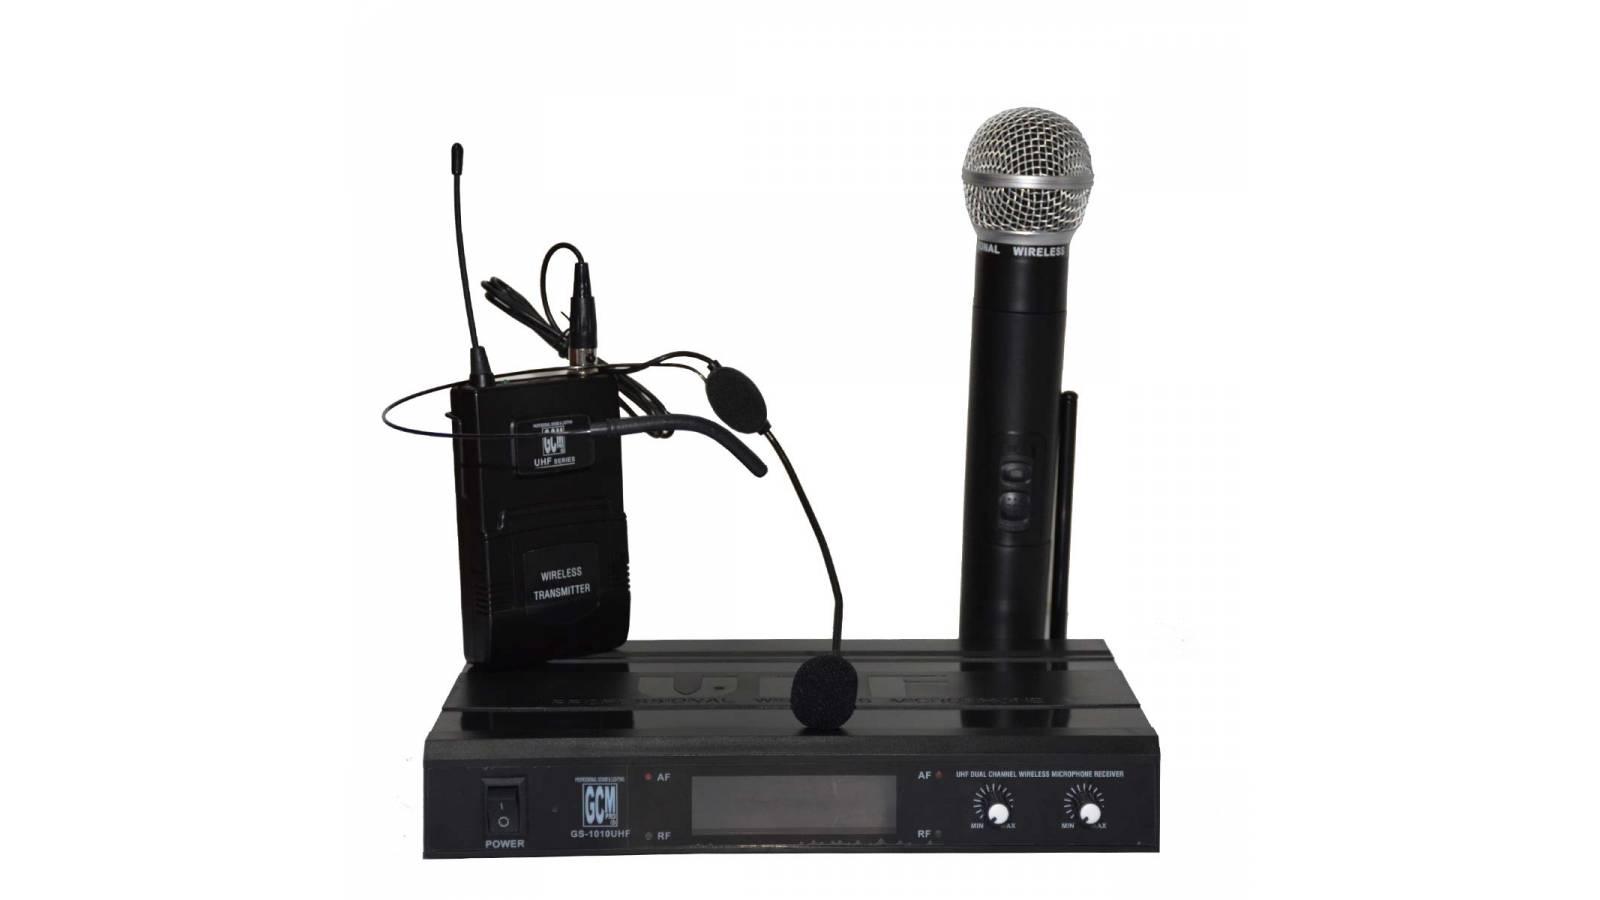 Microfono inalambrico doble Vincha + Mano UHF GCM Pro GS-1010UHF